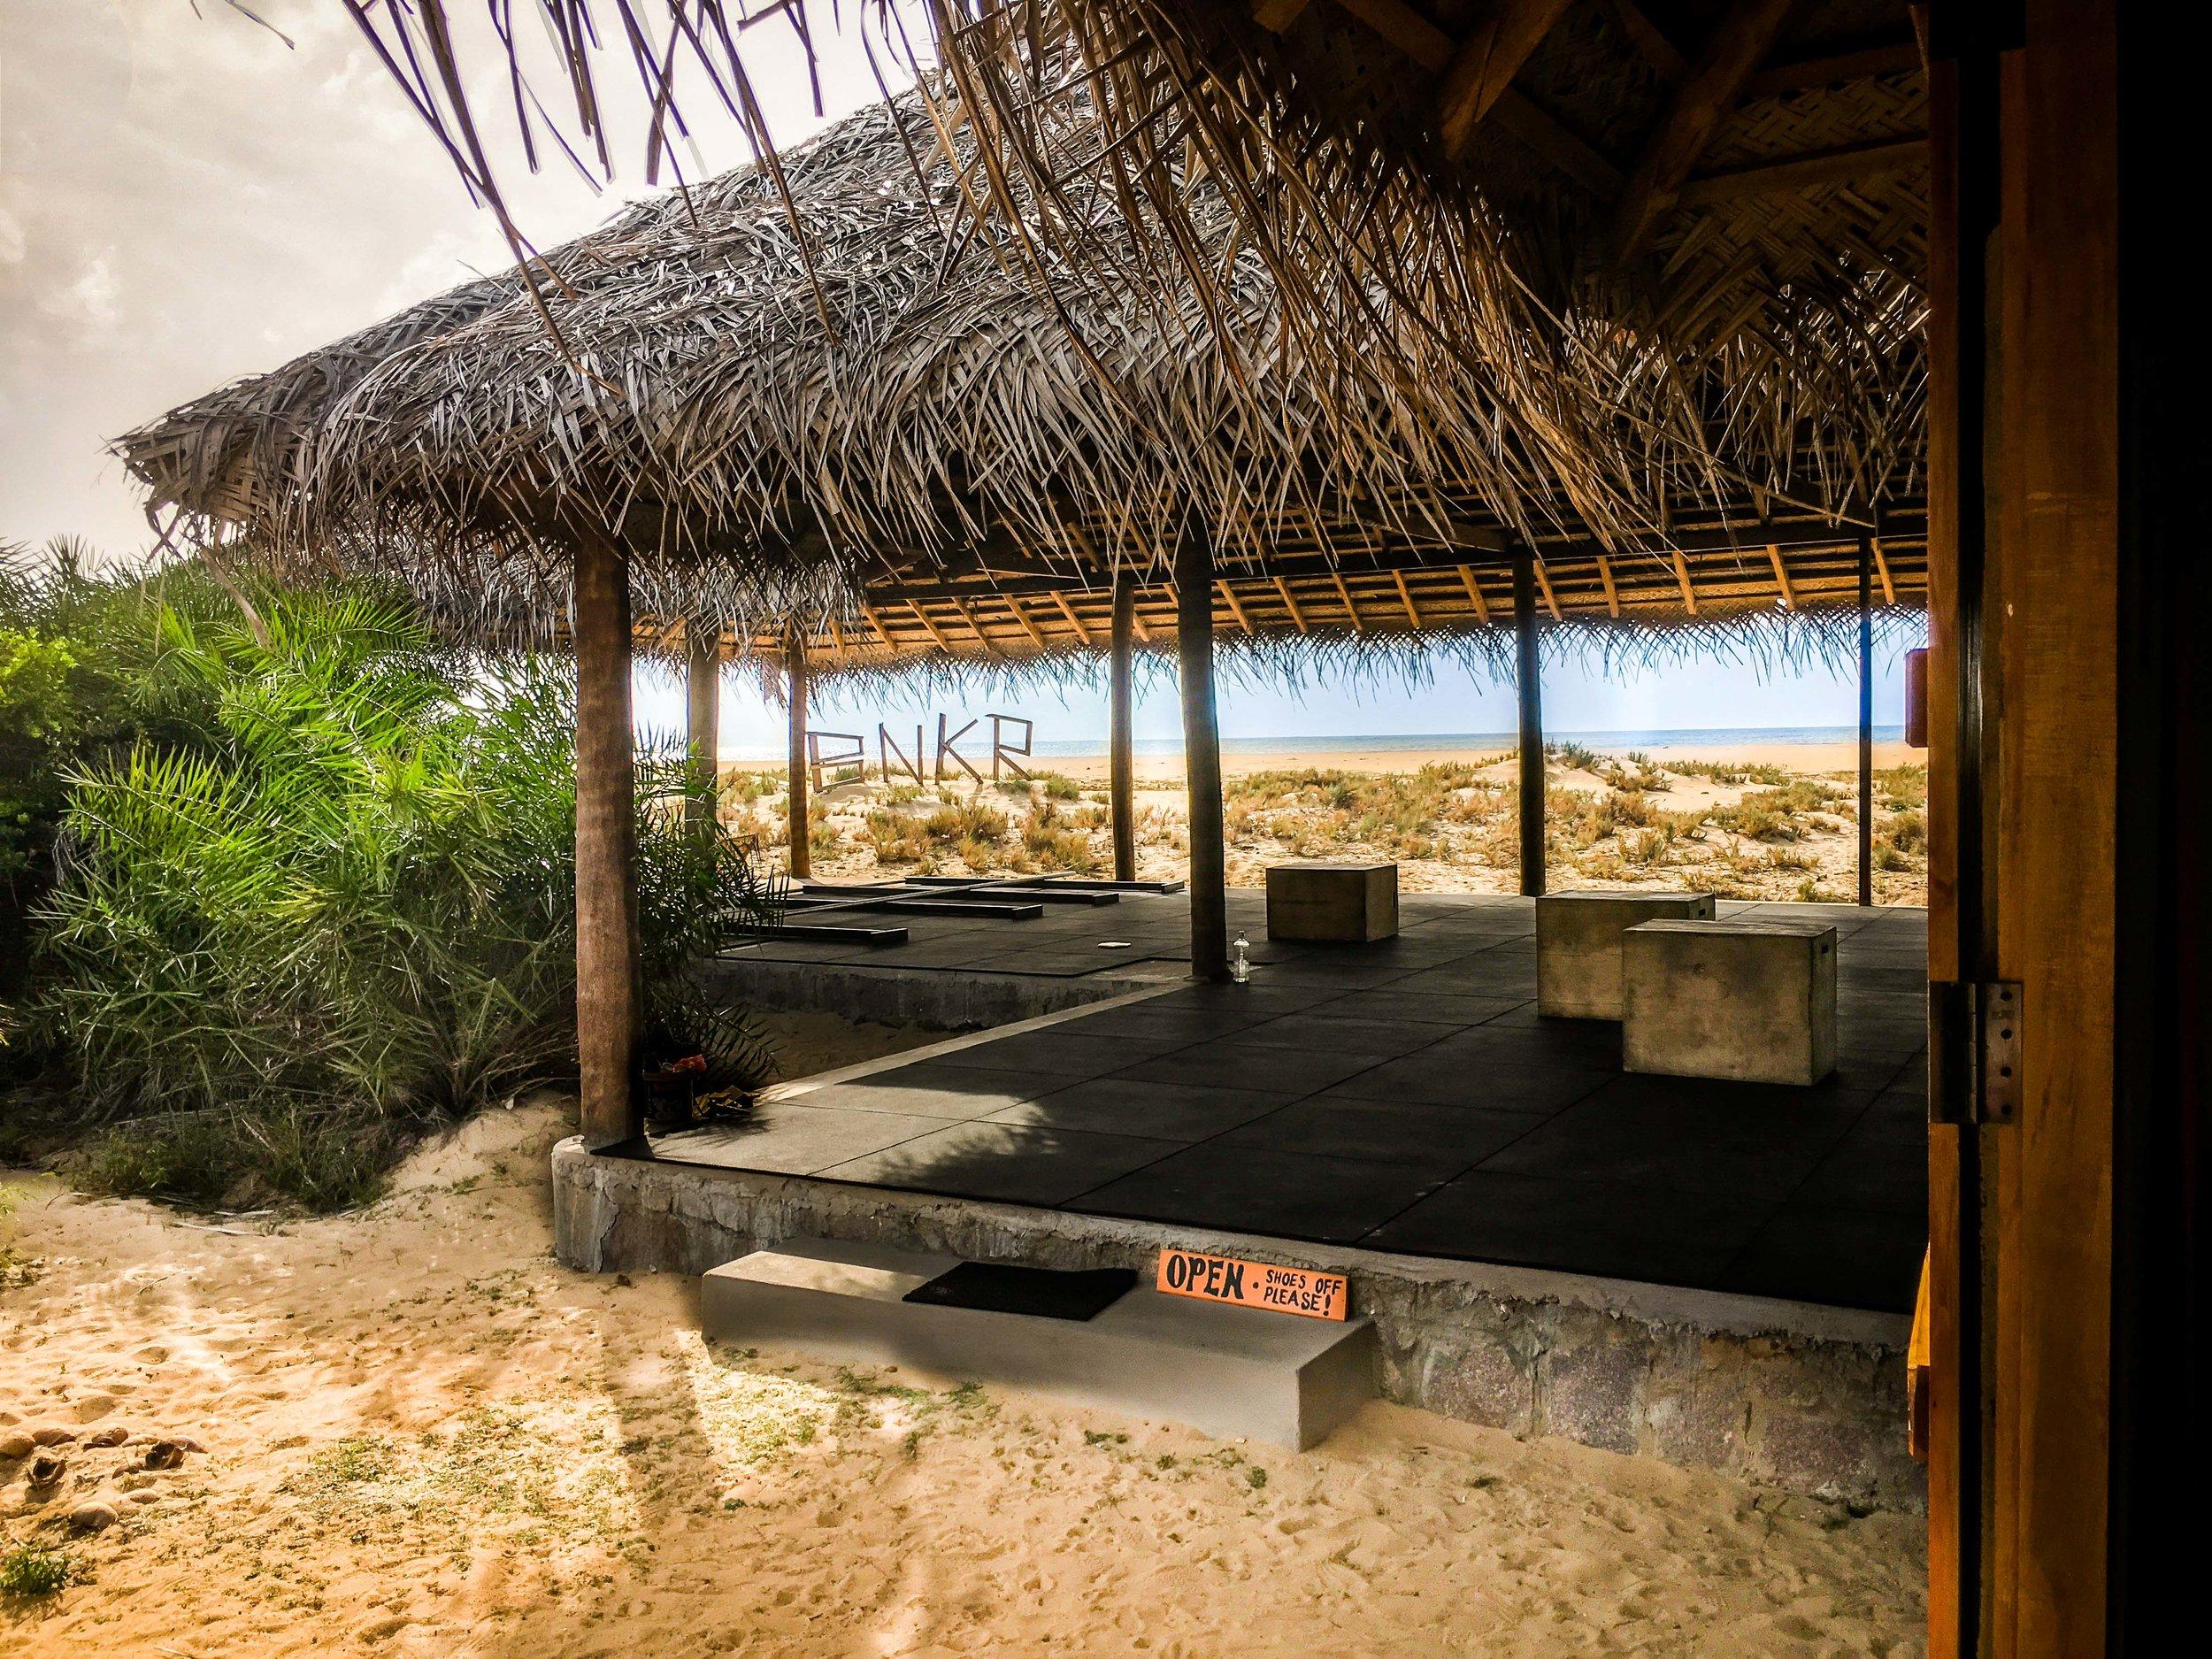 Remote_work_Beach_Sri_Lanka.jpg